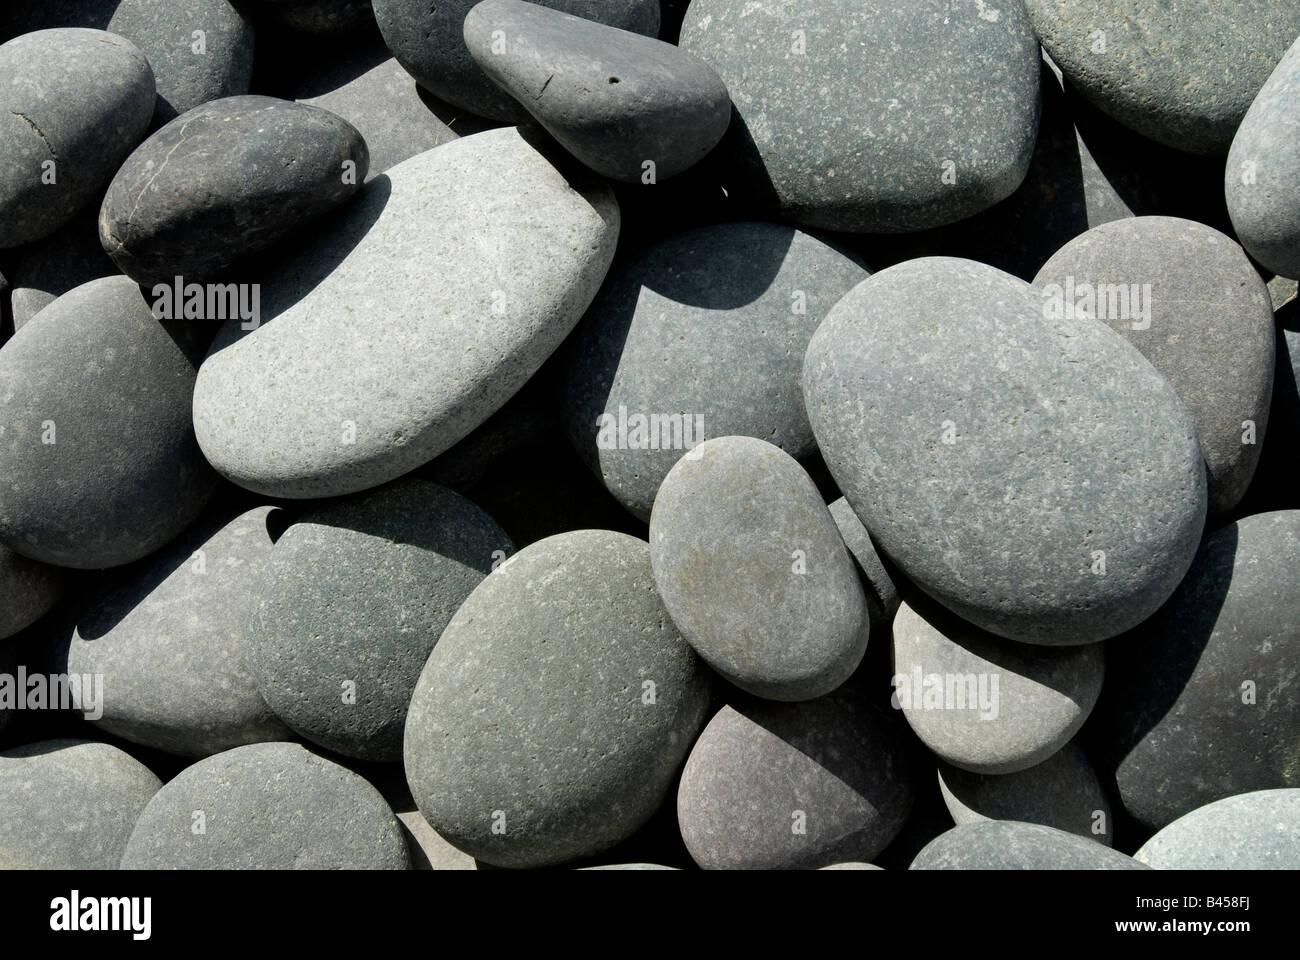 Smooth river stones in pathway of garden walkway, Miami, Florida. - Stock Image